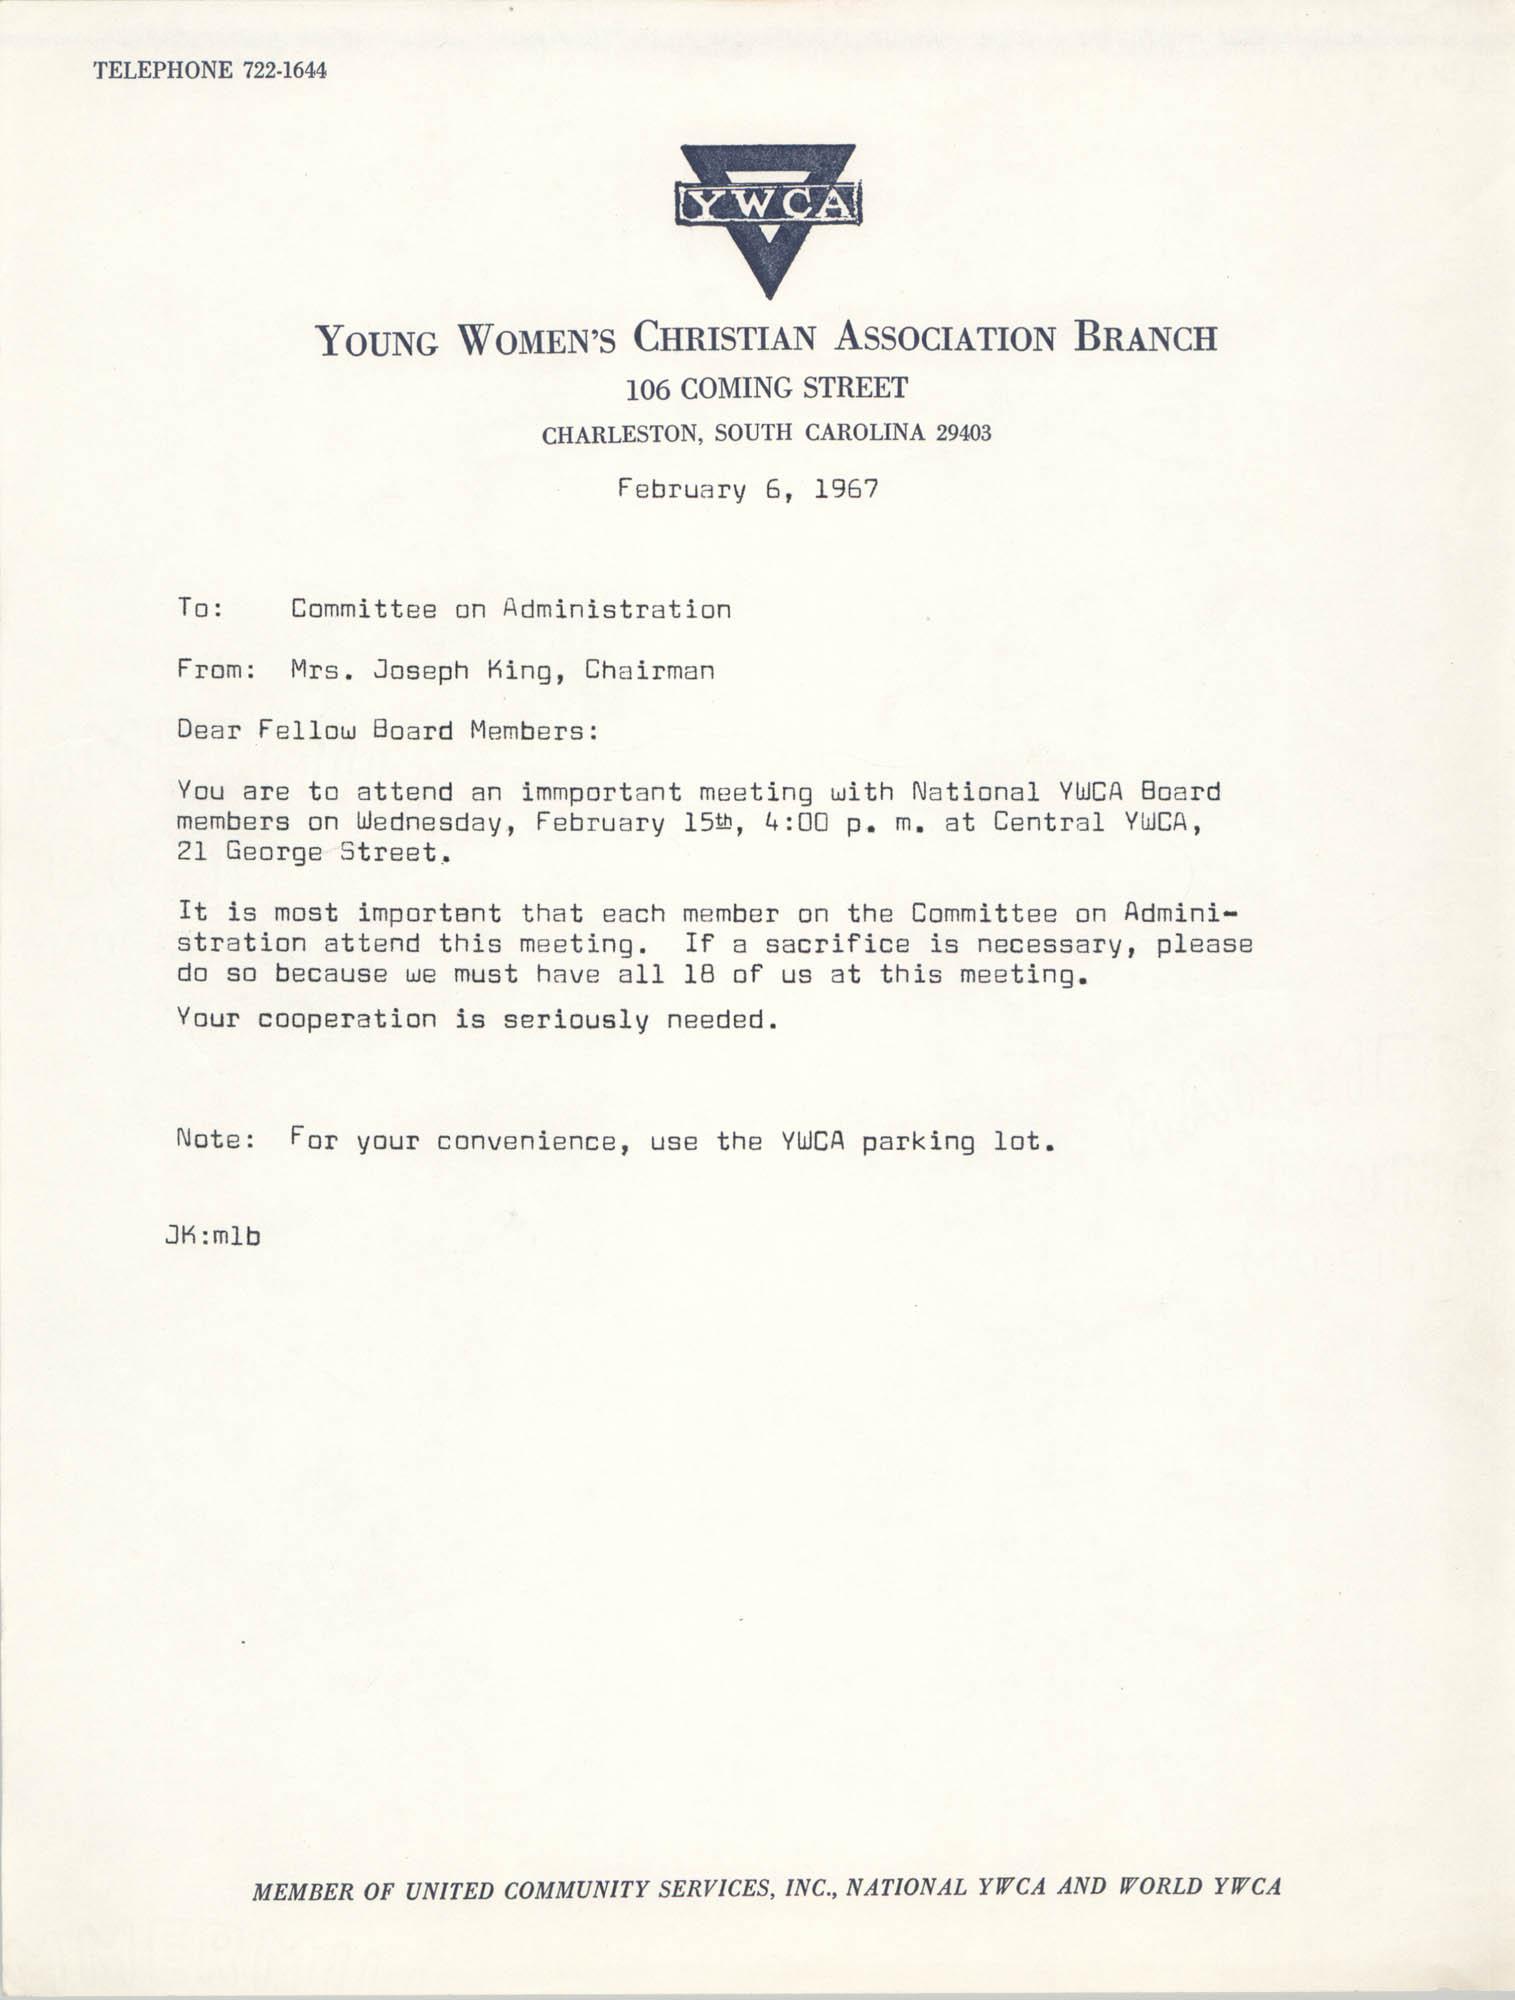 Coming Street Y.W.C.A. Memorandum, February 6, 1967